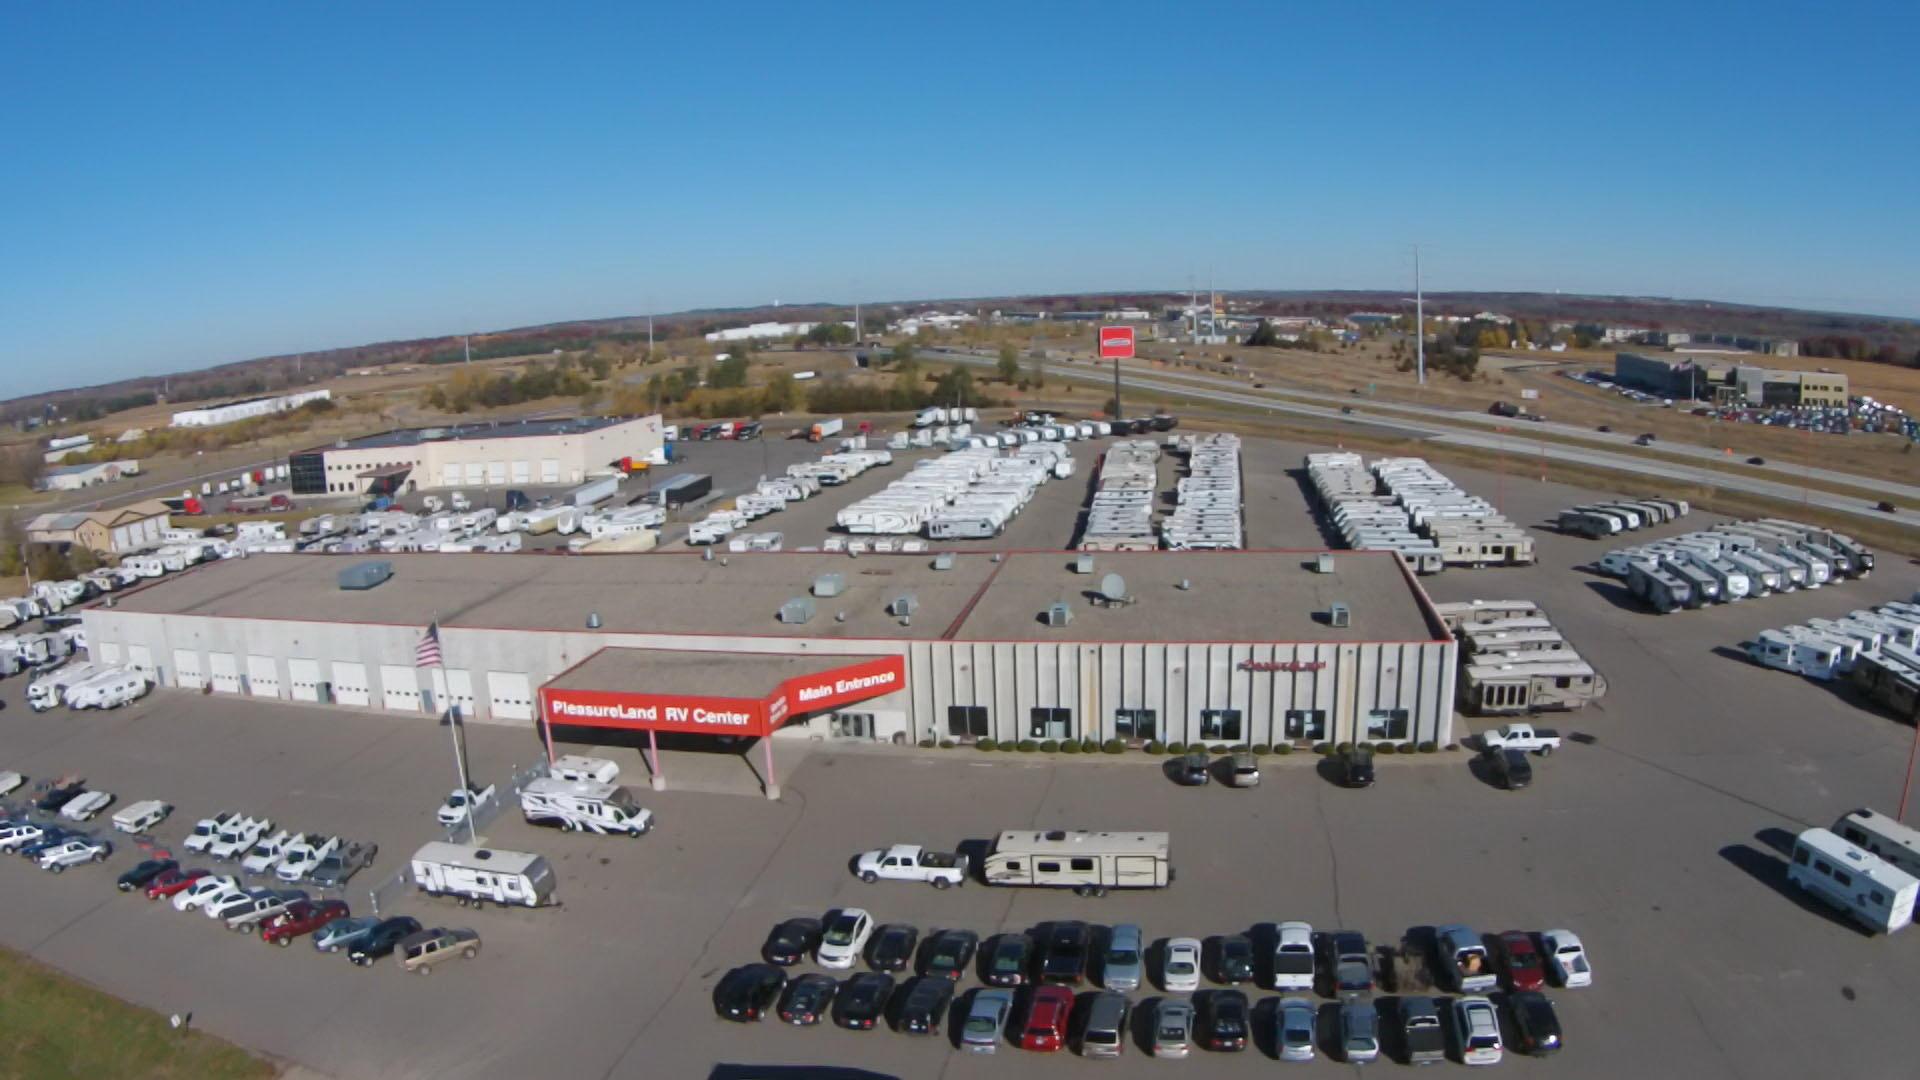 Pleasureland Rv Center St Cloud Camper Shell Supplier